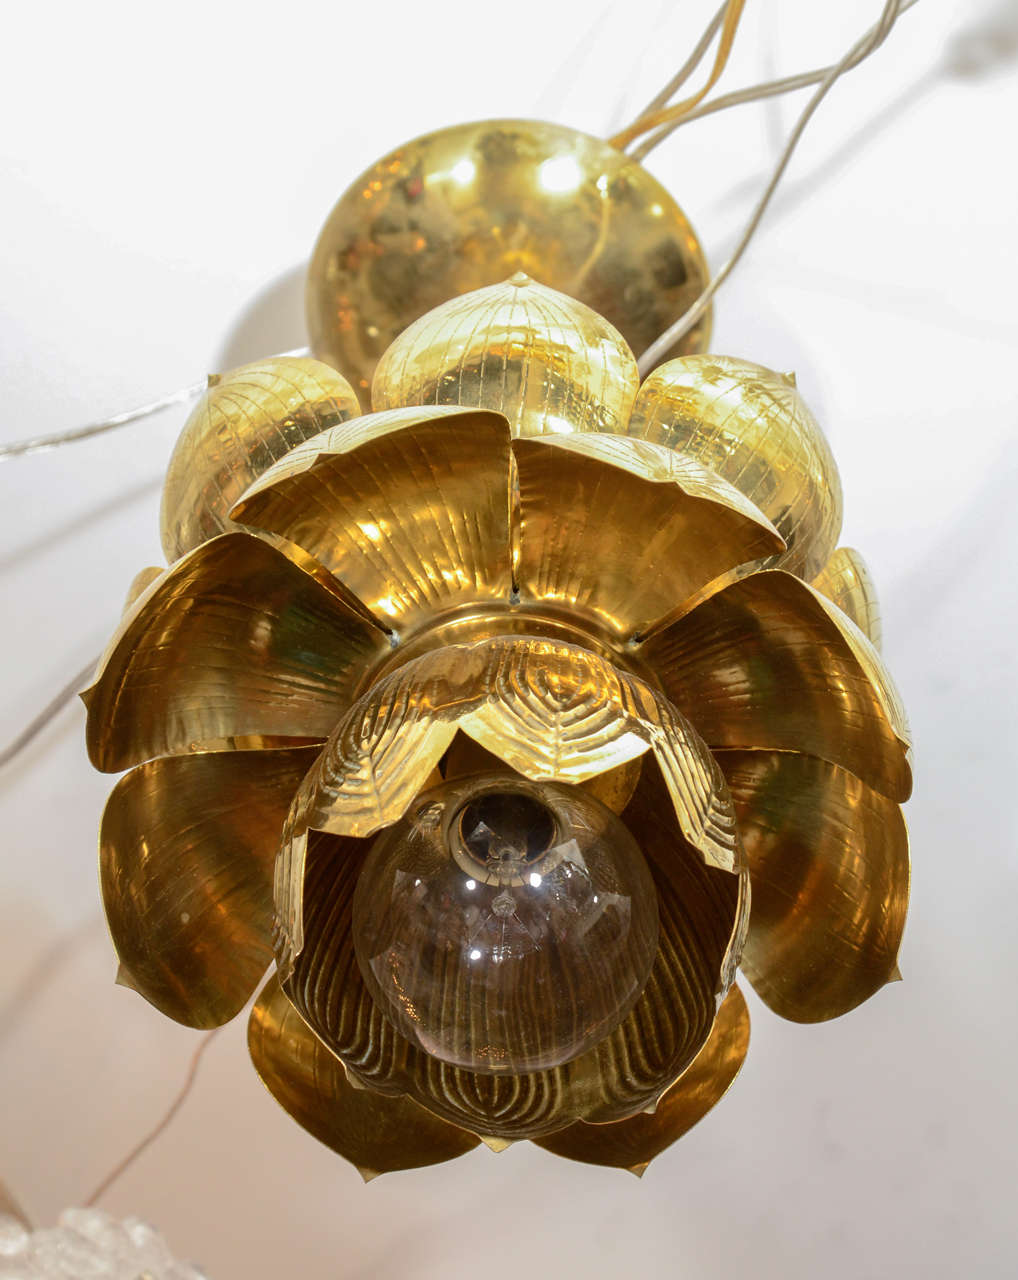 Small Brass Lotus Form Pendant Ceiling Fixtures By Feldman 7